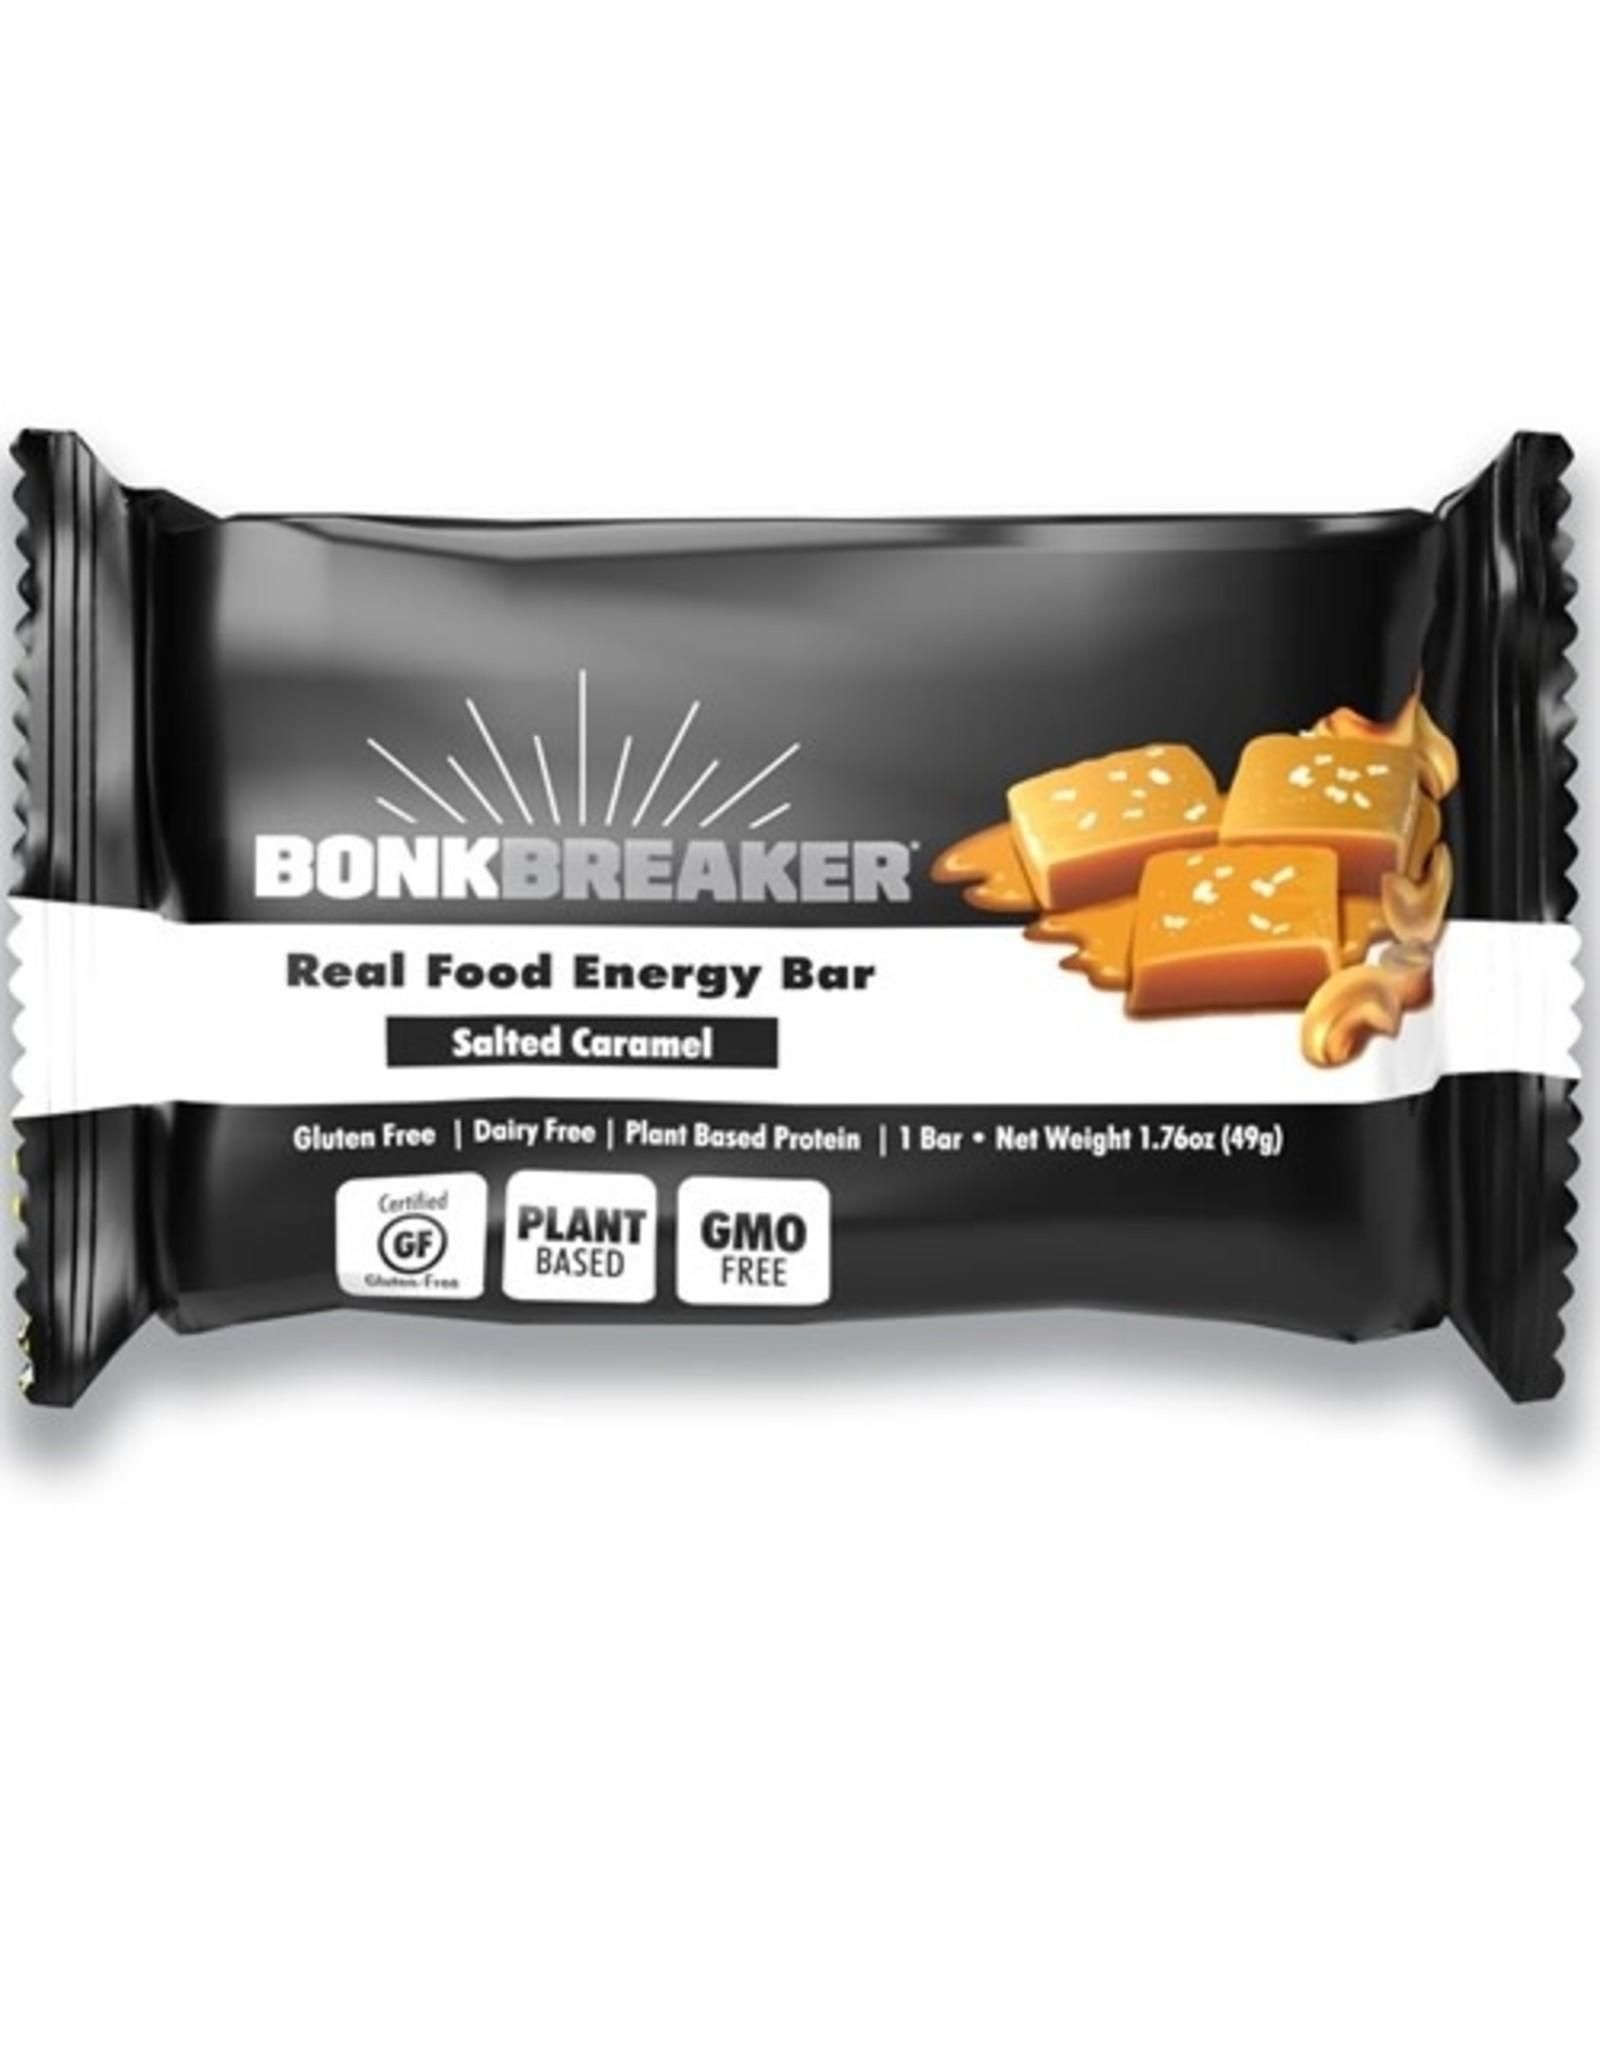 Bonk Breaker Bonk Breaker Real Food Energy Bar